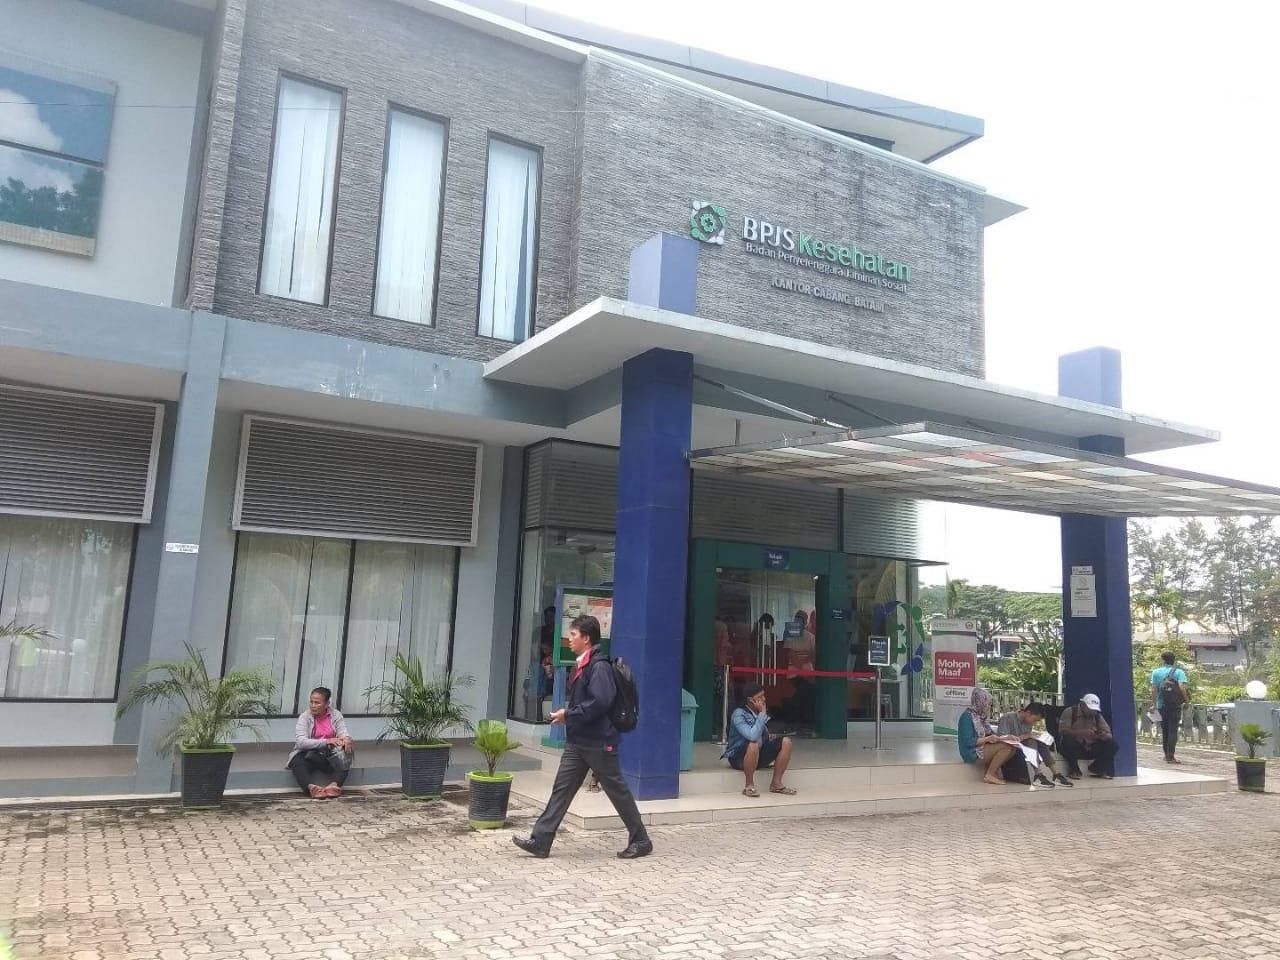 Kantor BPJS Kesehatan Cabang Batam. (IS/inikepri.com)